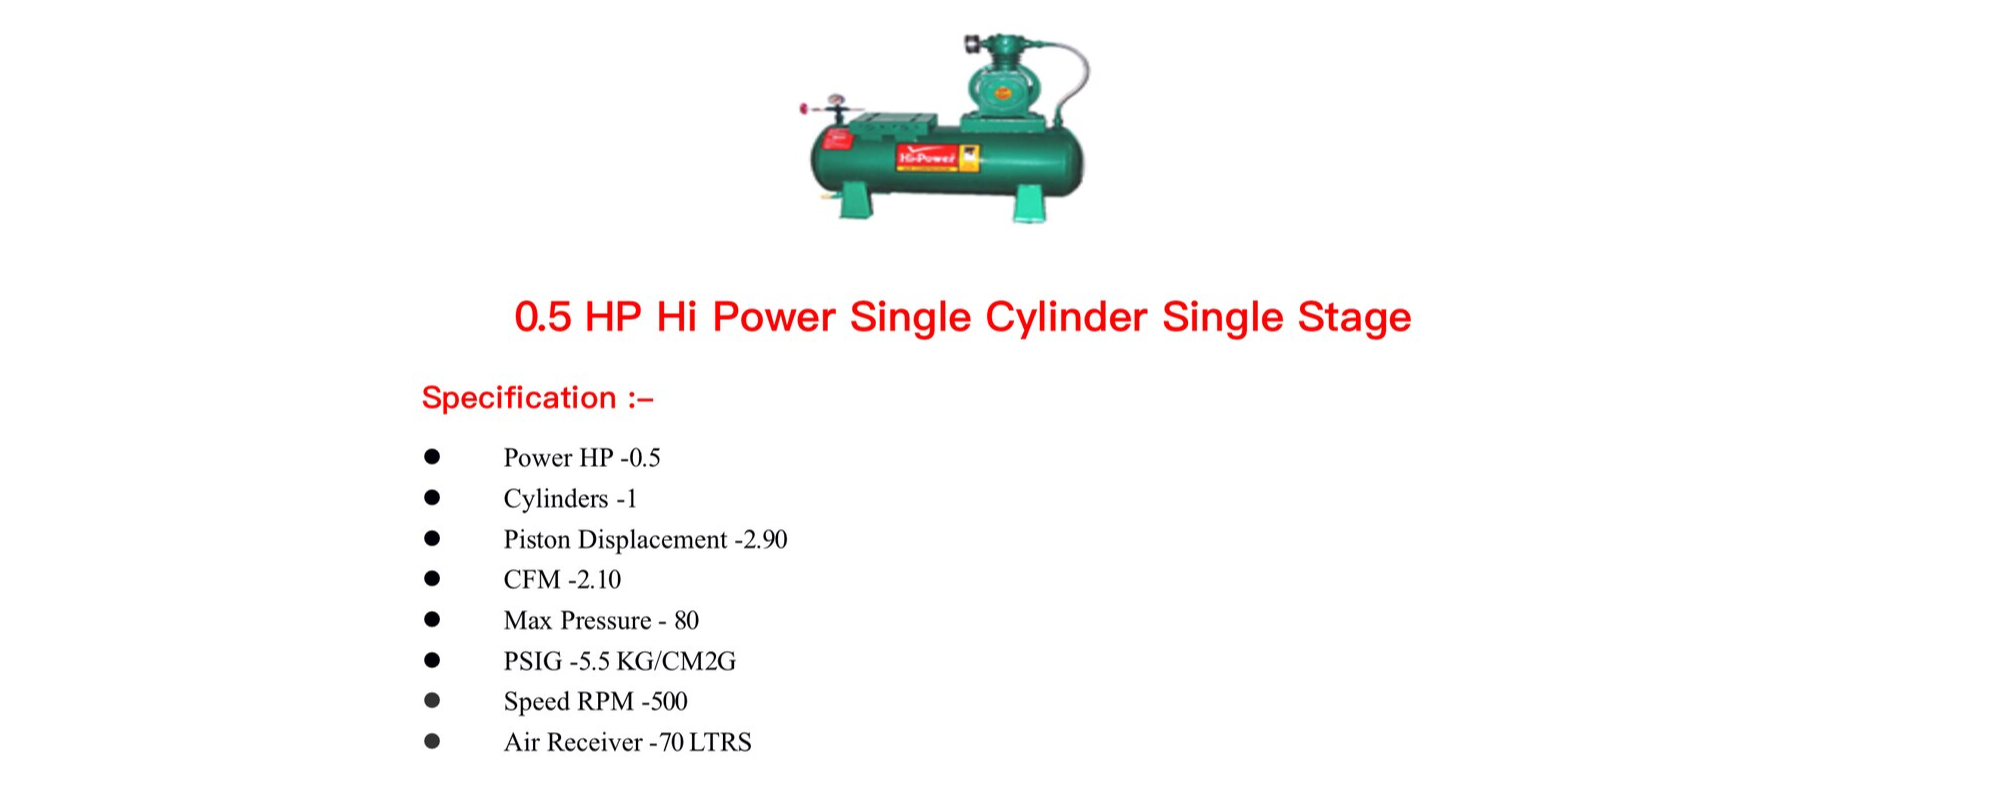 Hi-power Air Compressor - Industrial Air Compressor Dealer in Shimlapuri, Ludhiana